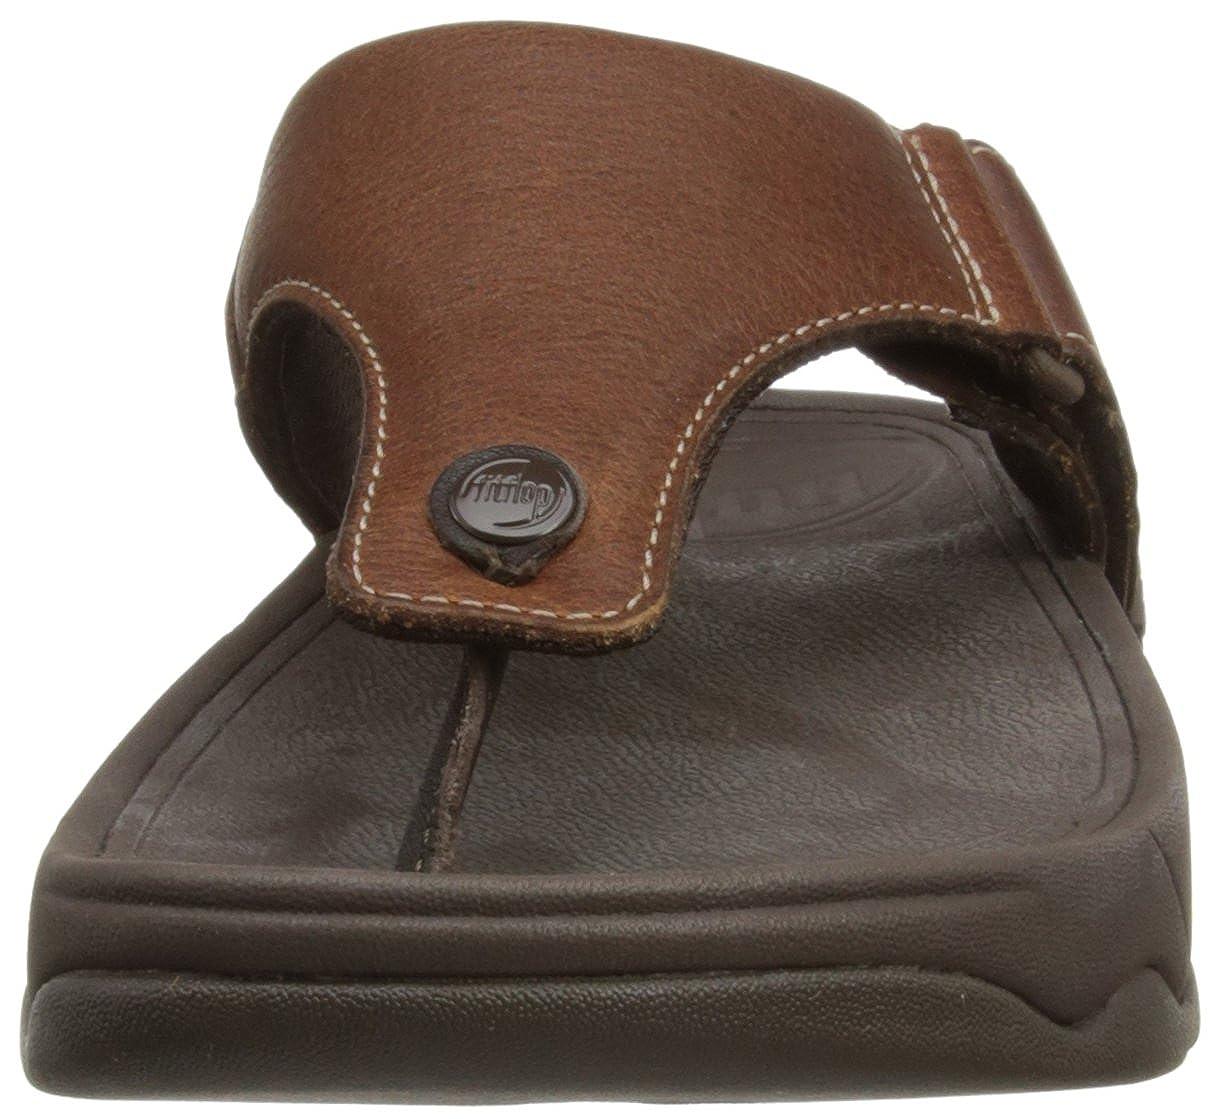 1e0750d0b2b FitFlop Sandals Trakk II Tan 11.5 Tan  Amazon.co.uk  Shoes   Bags